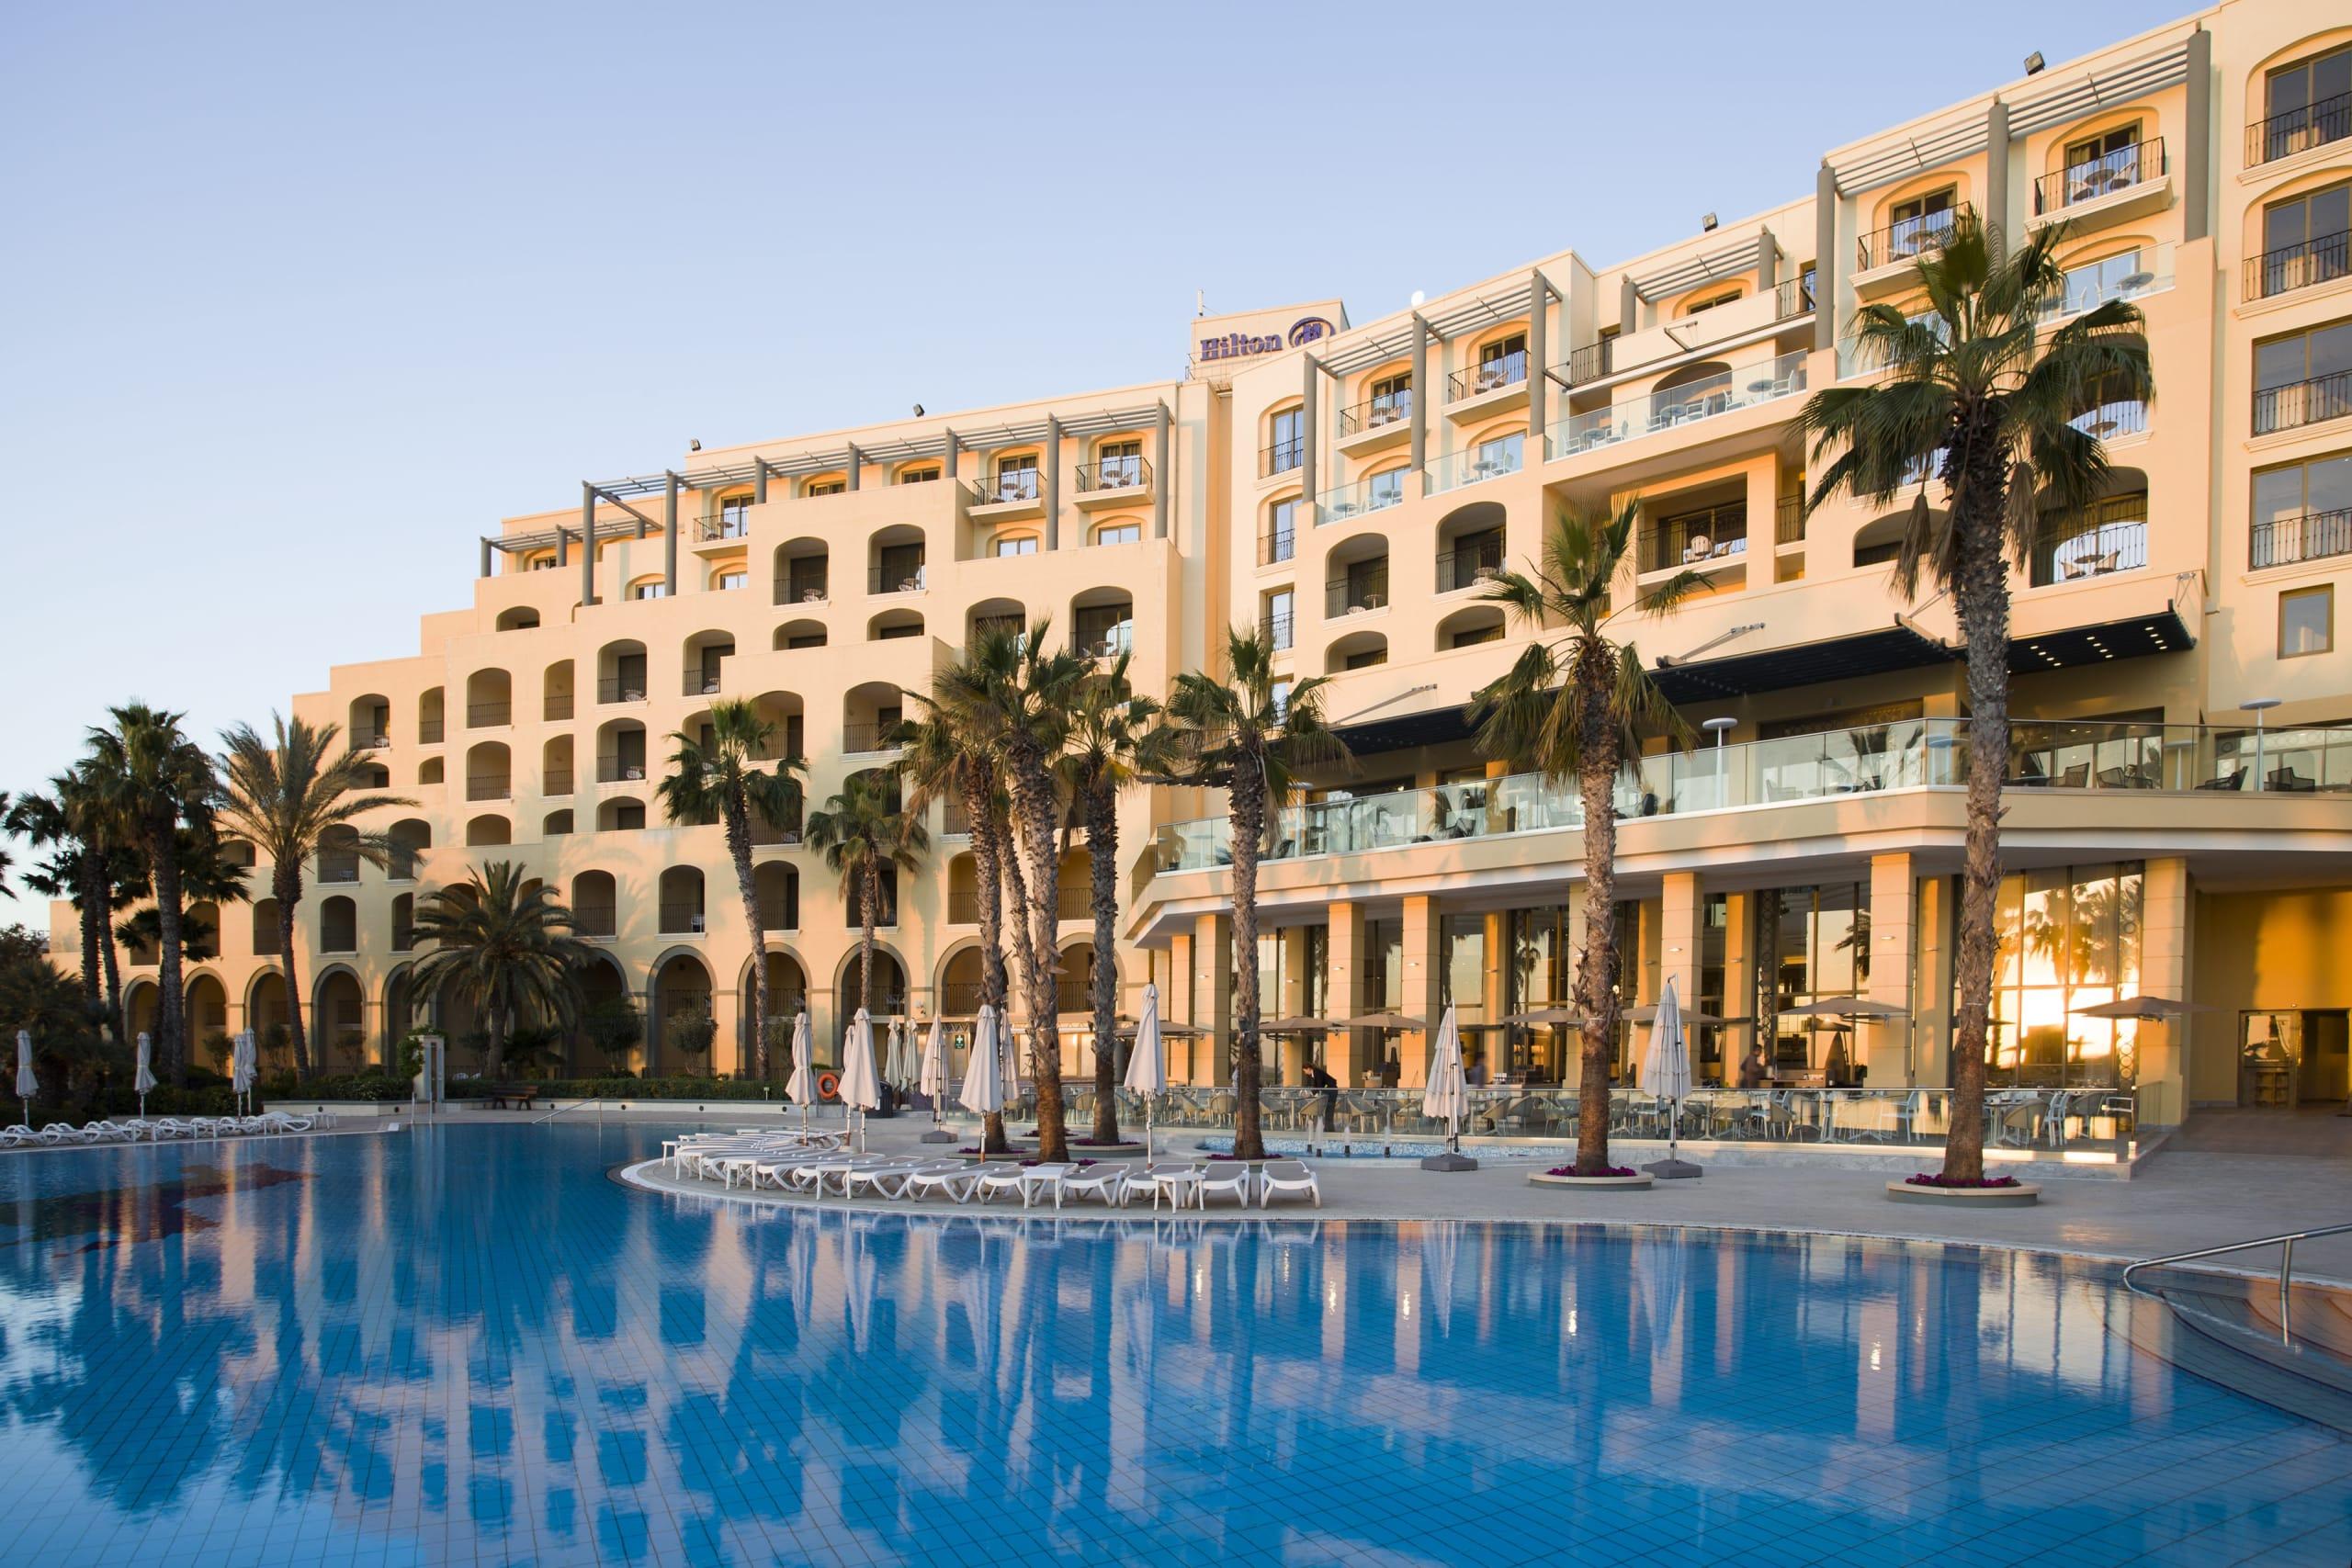 Hilton Malta hotel exterior